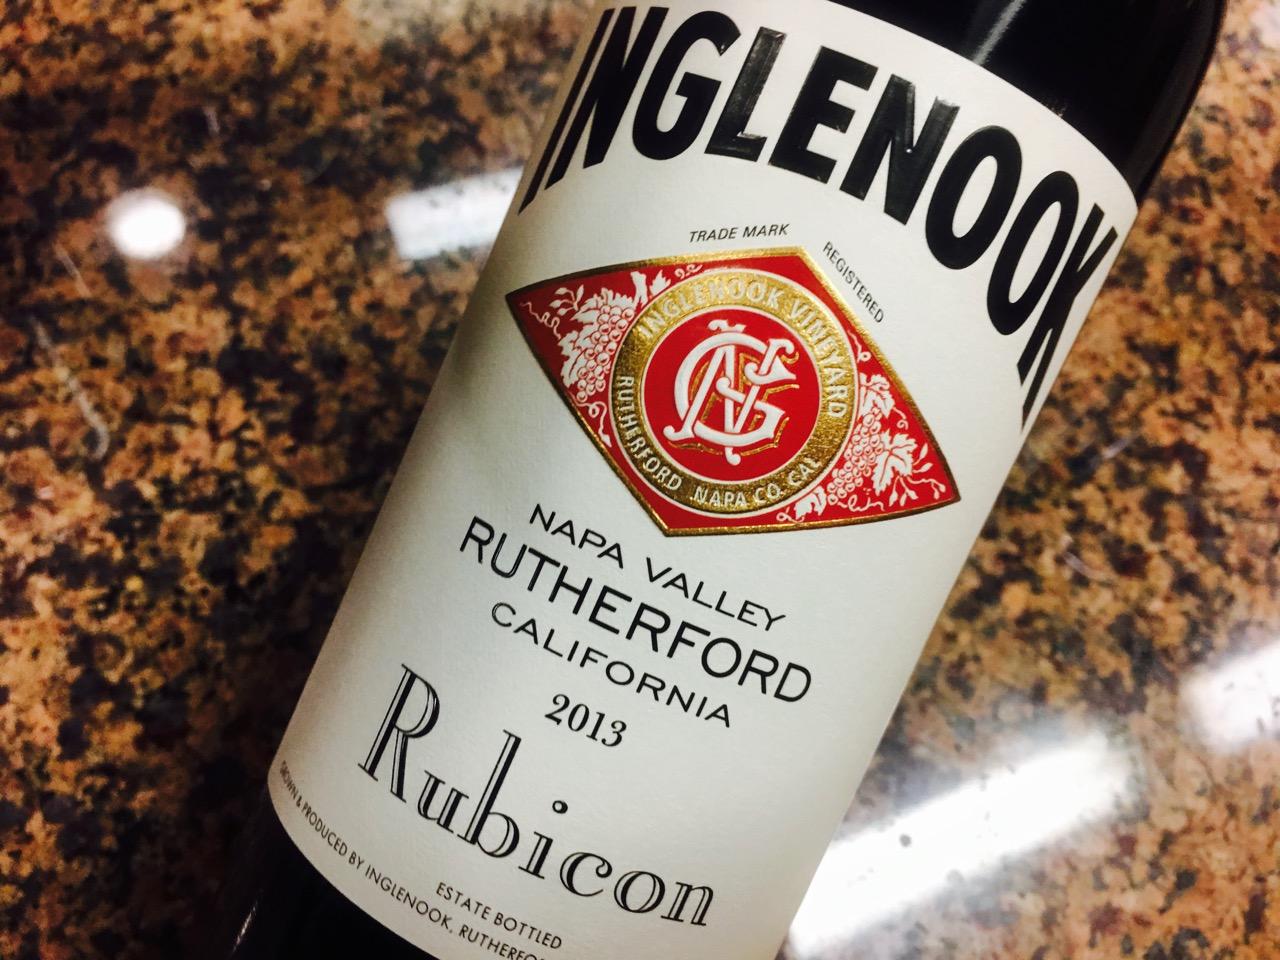 2013 Inglenook Rubicon Cabernet Sauvignon Rutherford Napa Valley